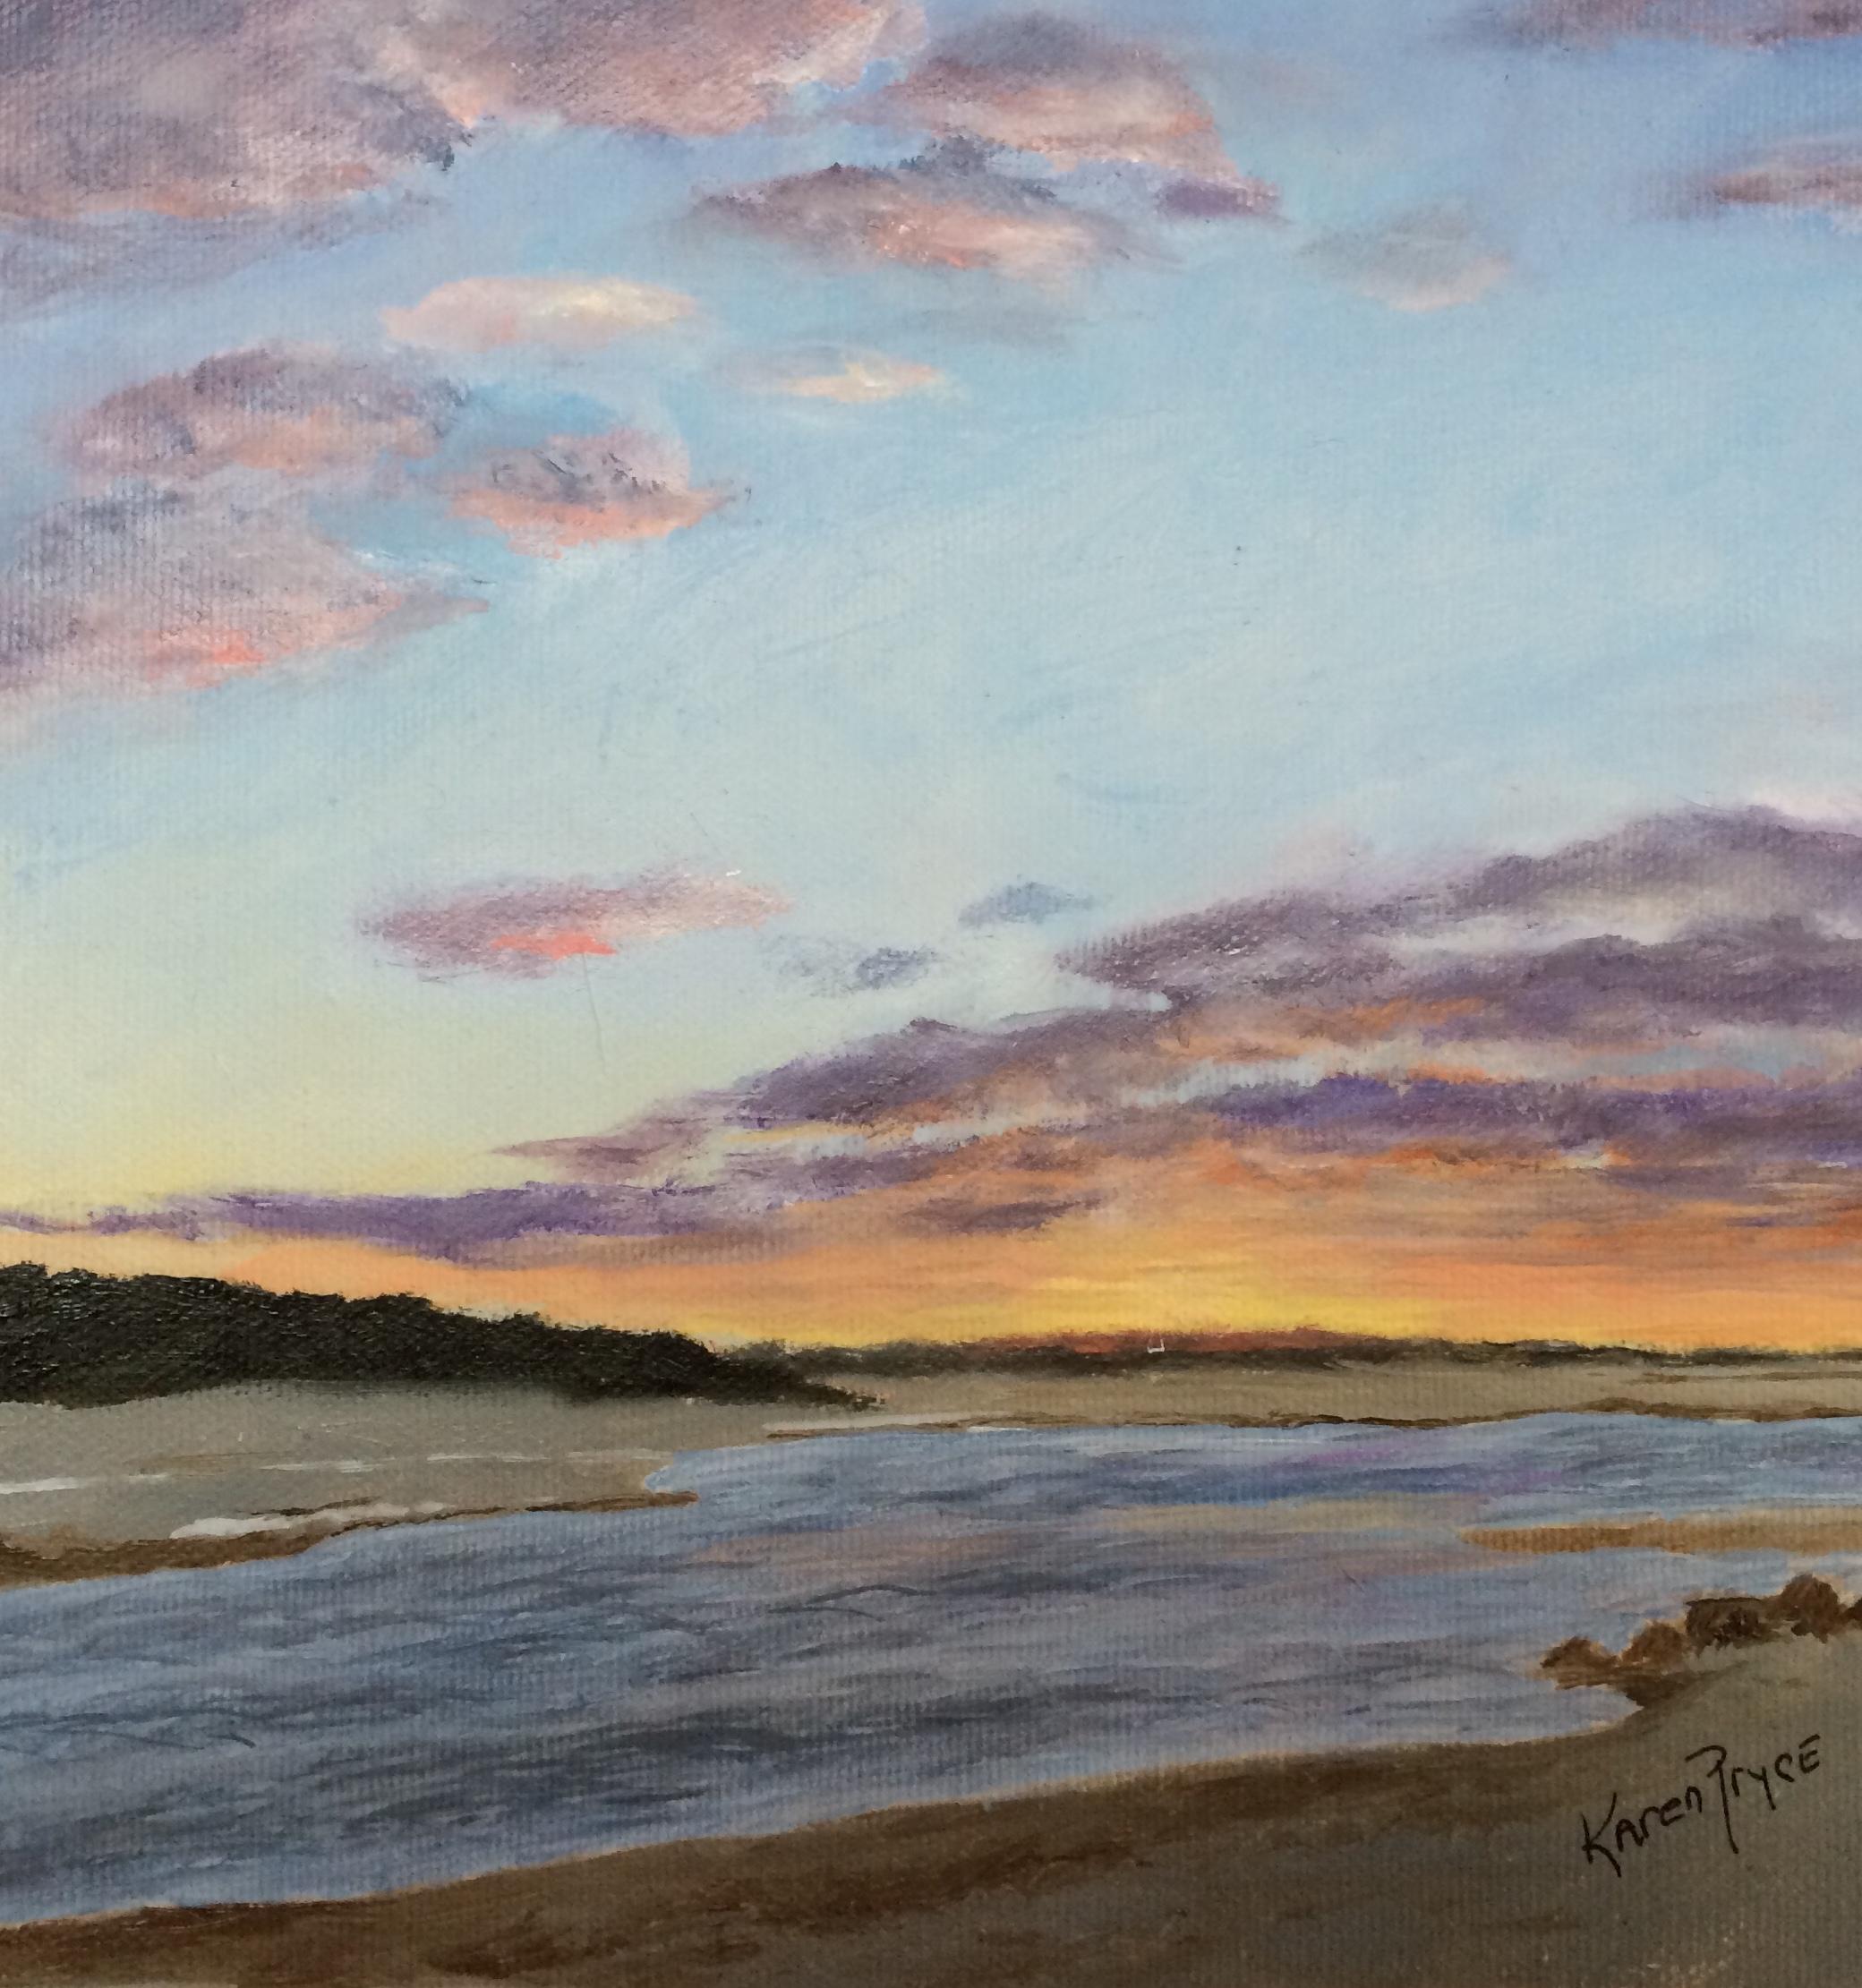 Paine's Creek Sunset_Pryce